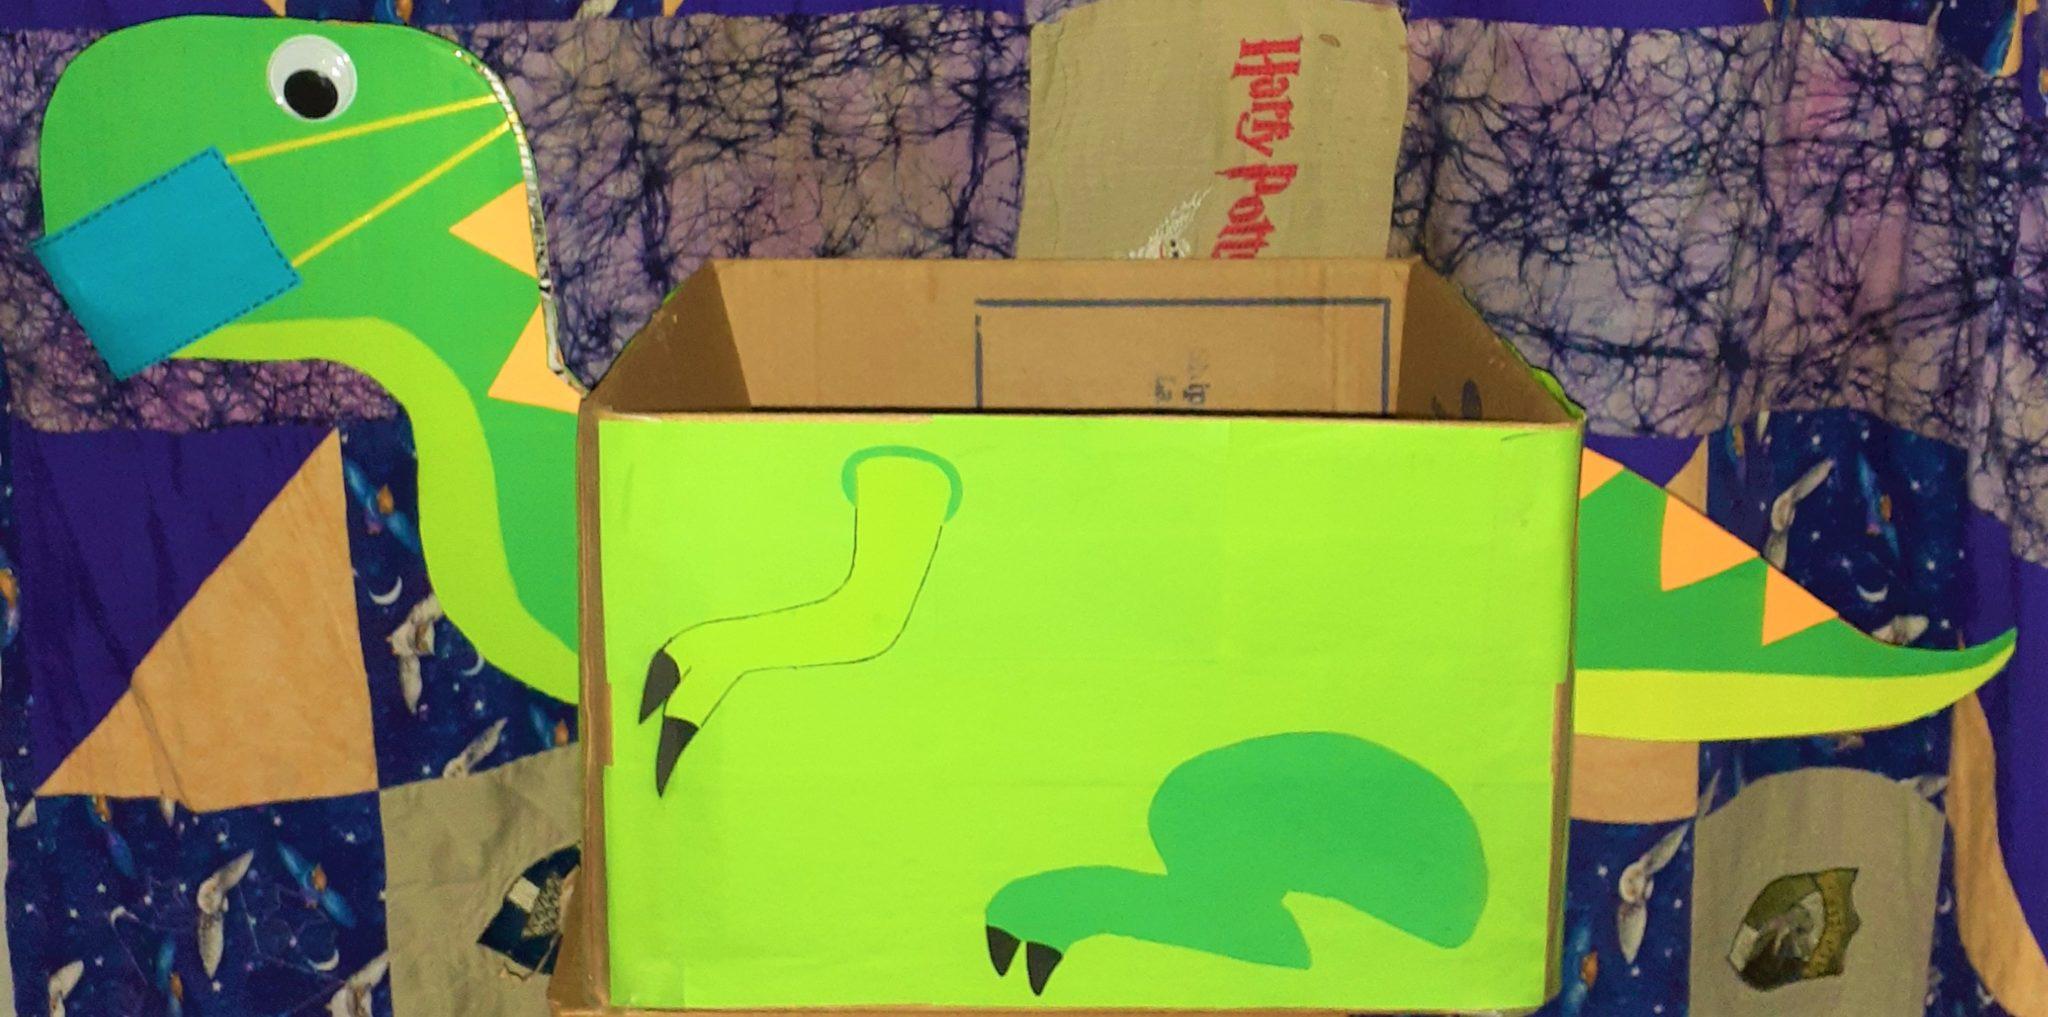 dinosaur covid book boxes